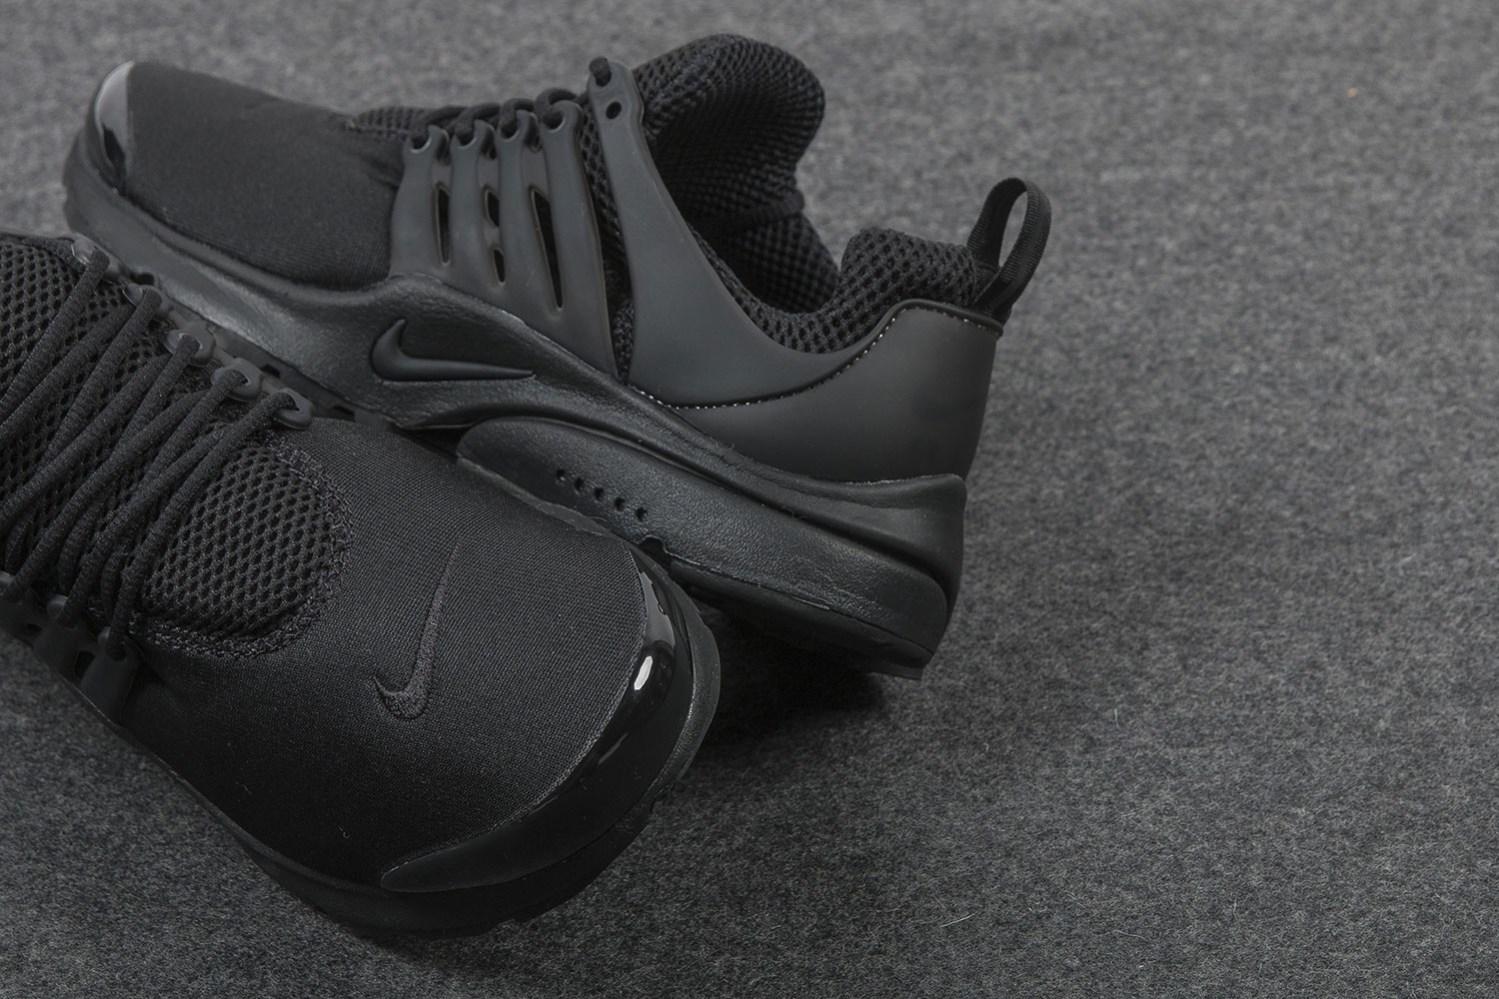 sale retailer 009e0 644e6 nike-air-presto-triple-black-sneaker-2.jpg